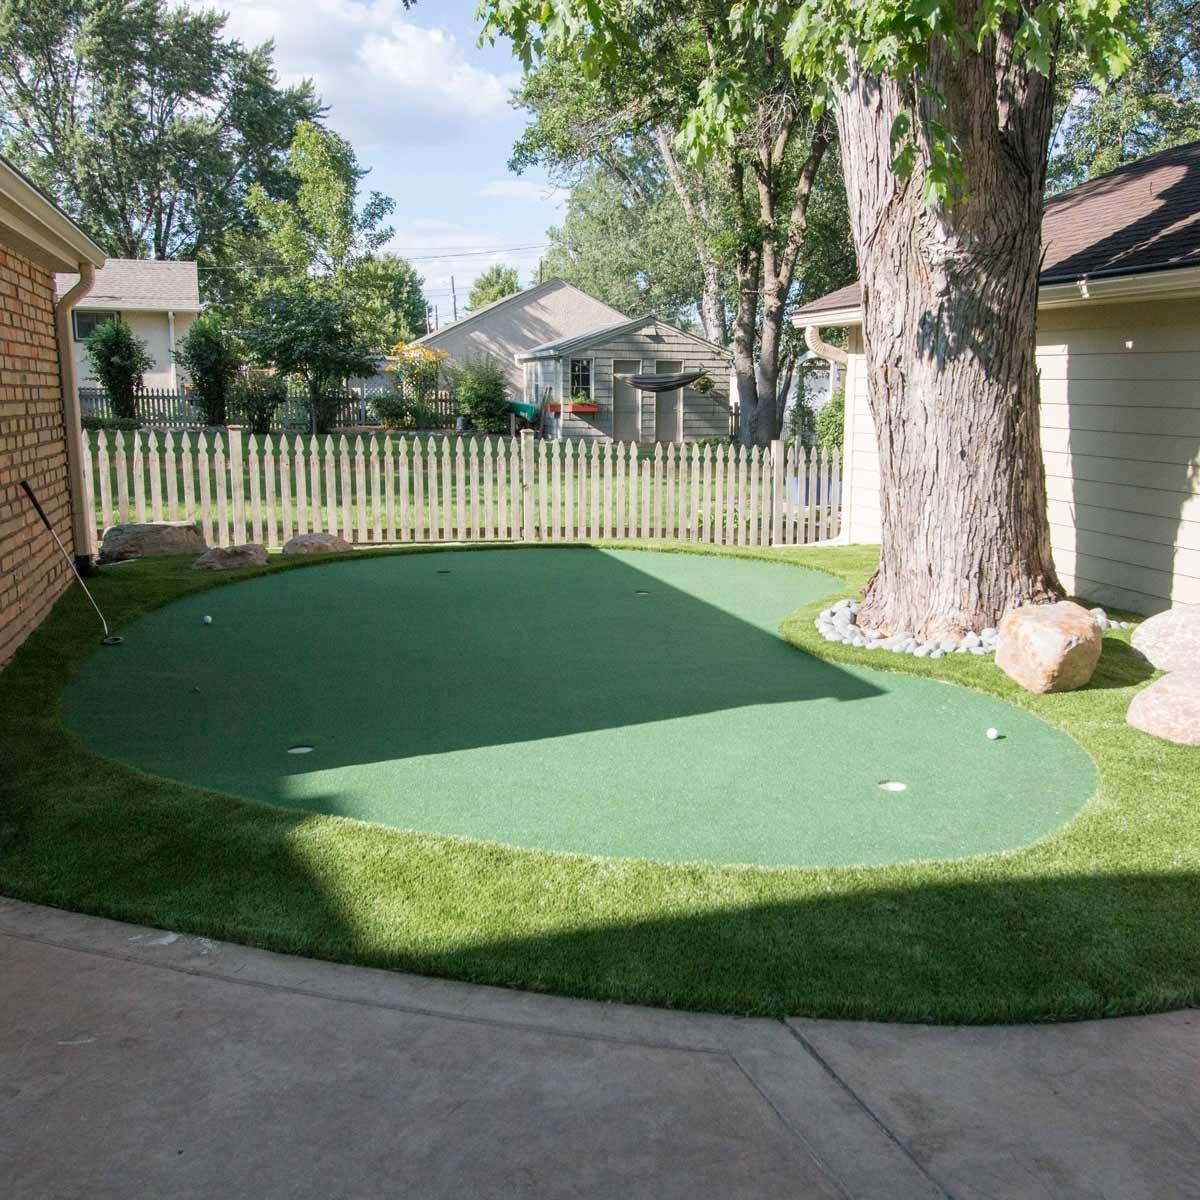 19 Crazy Cool Backyard Putting Greens — The Family Handyman on